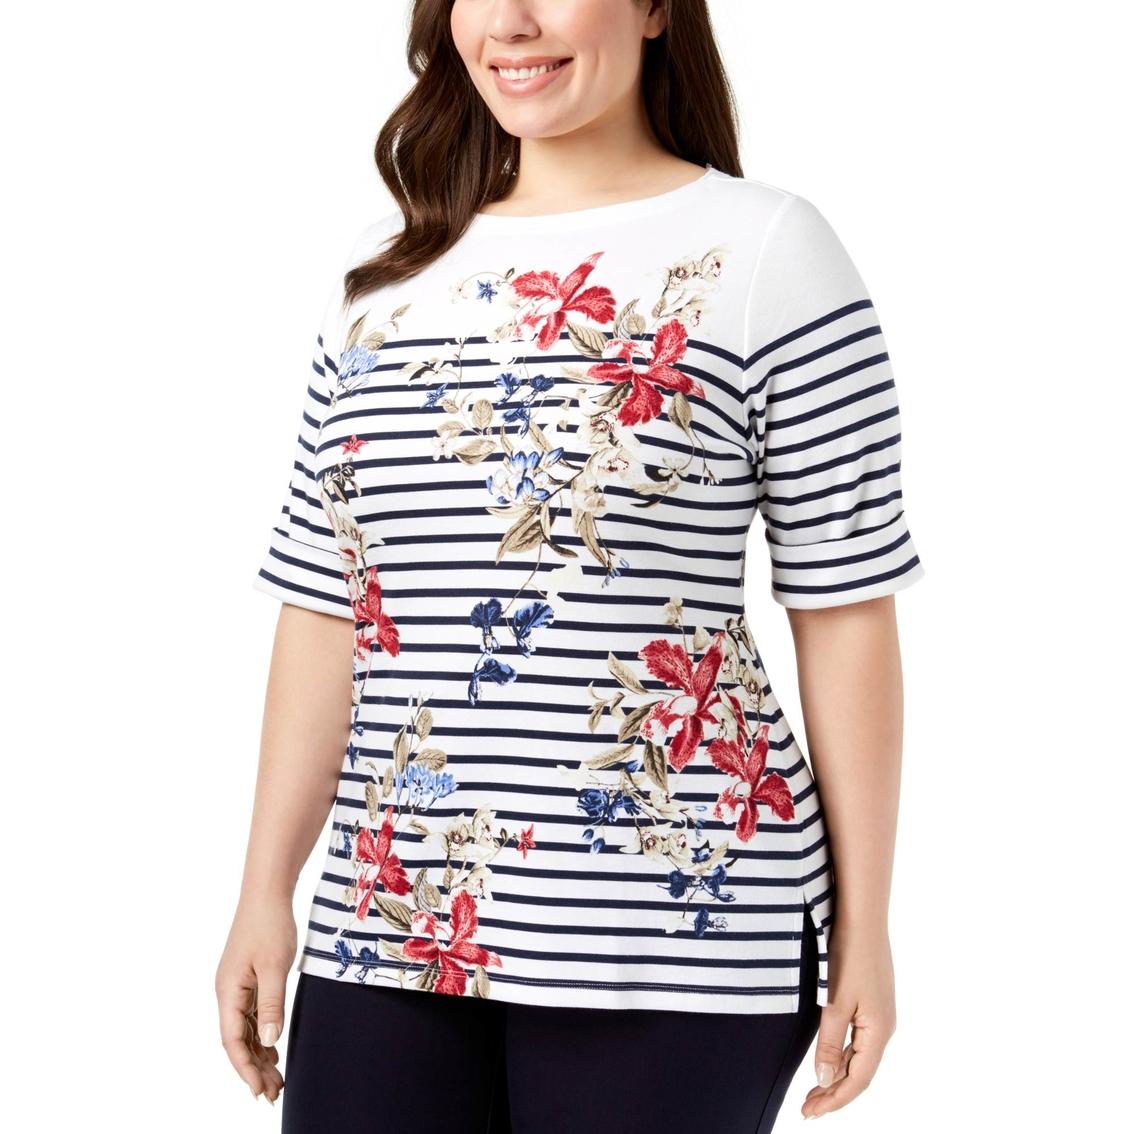 e0bd61ac3ea1 Karen Scott Plus Size Printed Boat Neck Top | Casual Shirts ...